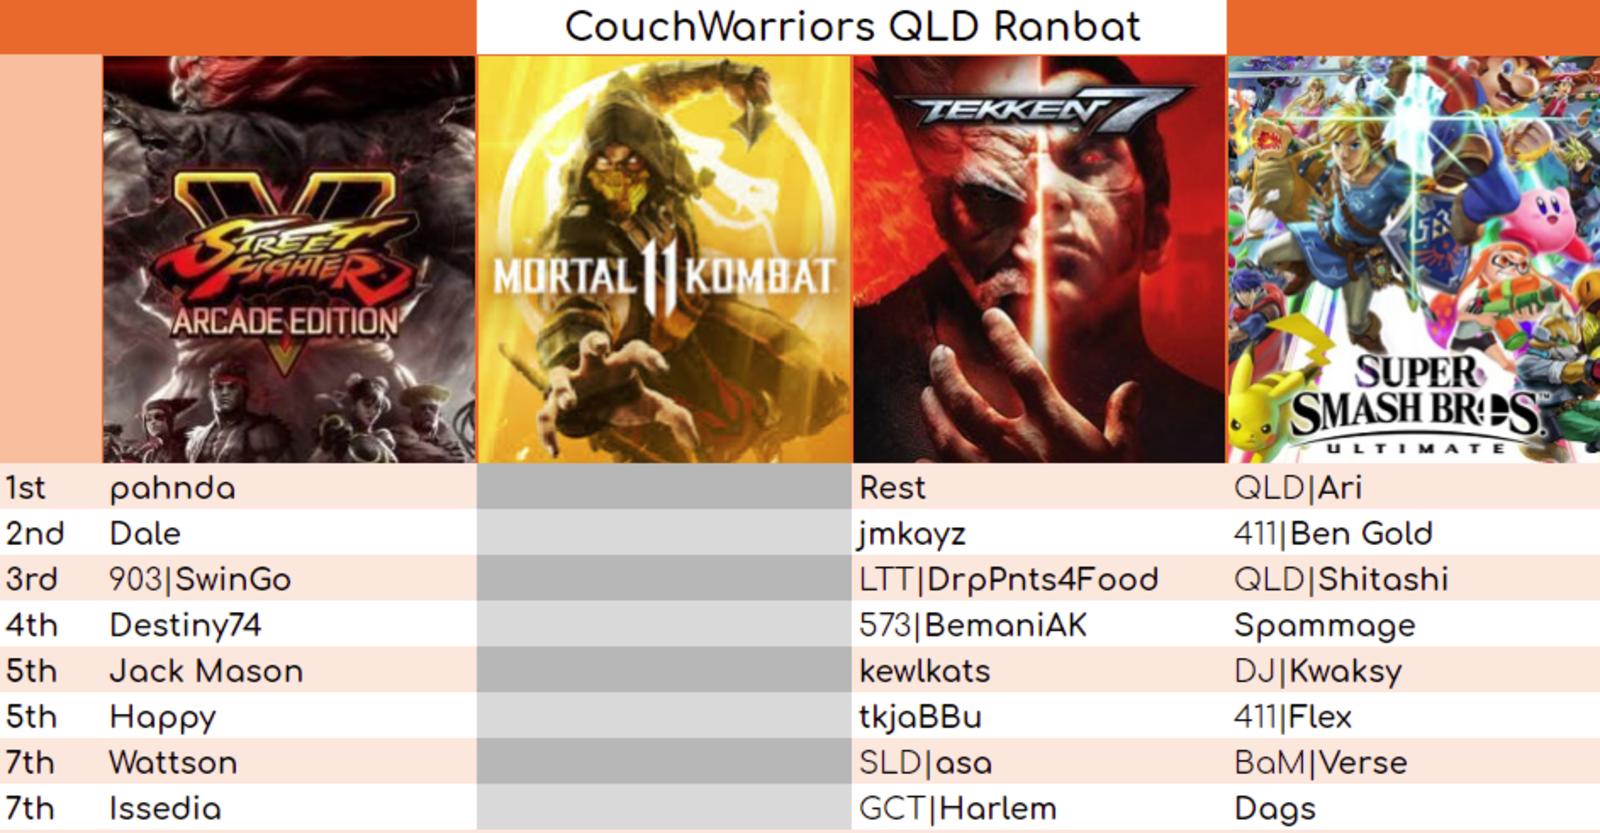 Results for QLD November Ranbat